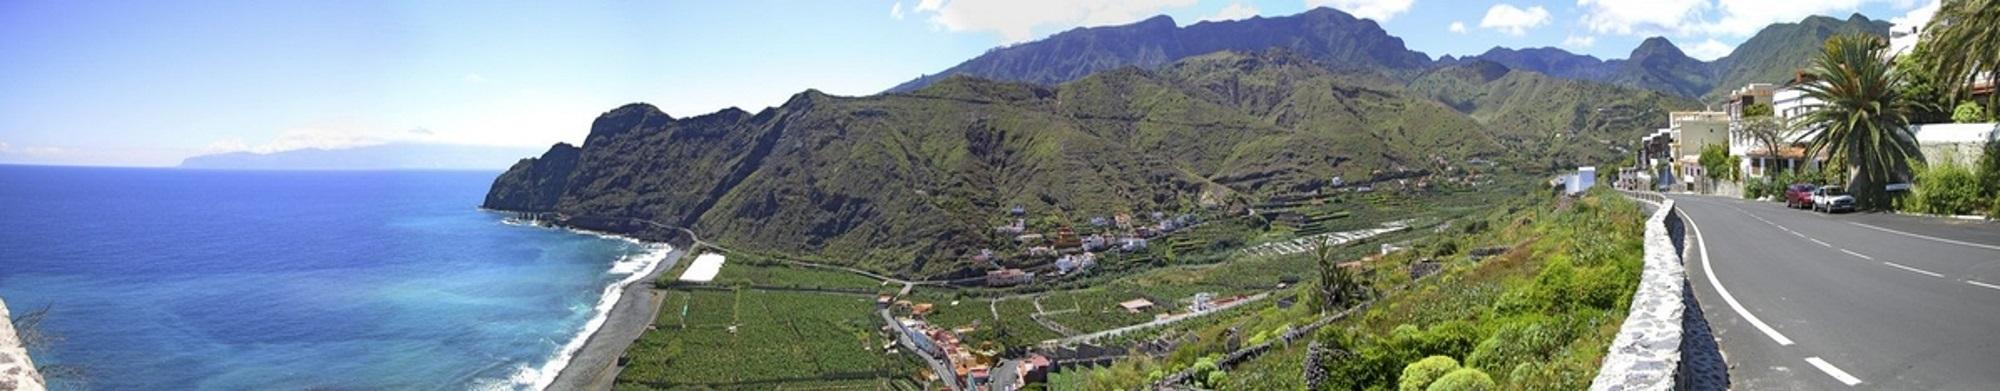 La Gomera Reisen Panorama